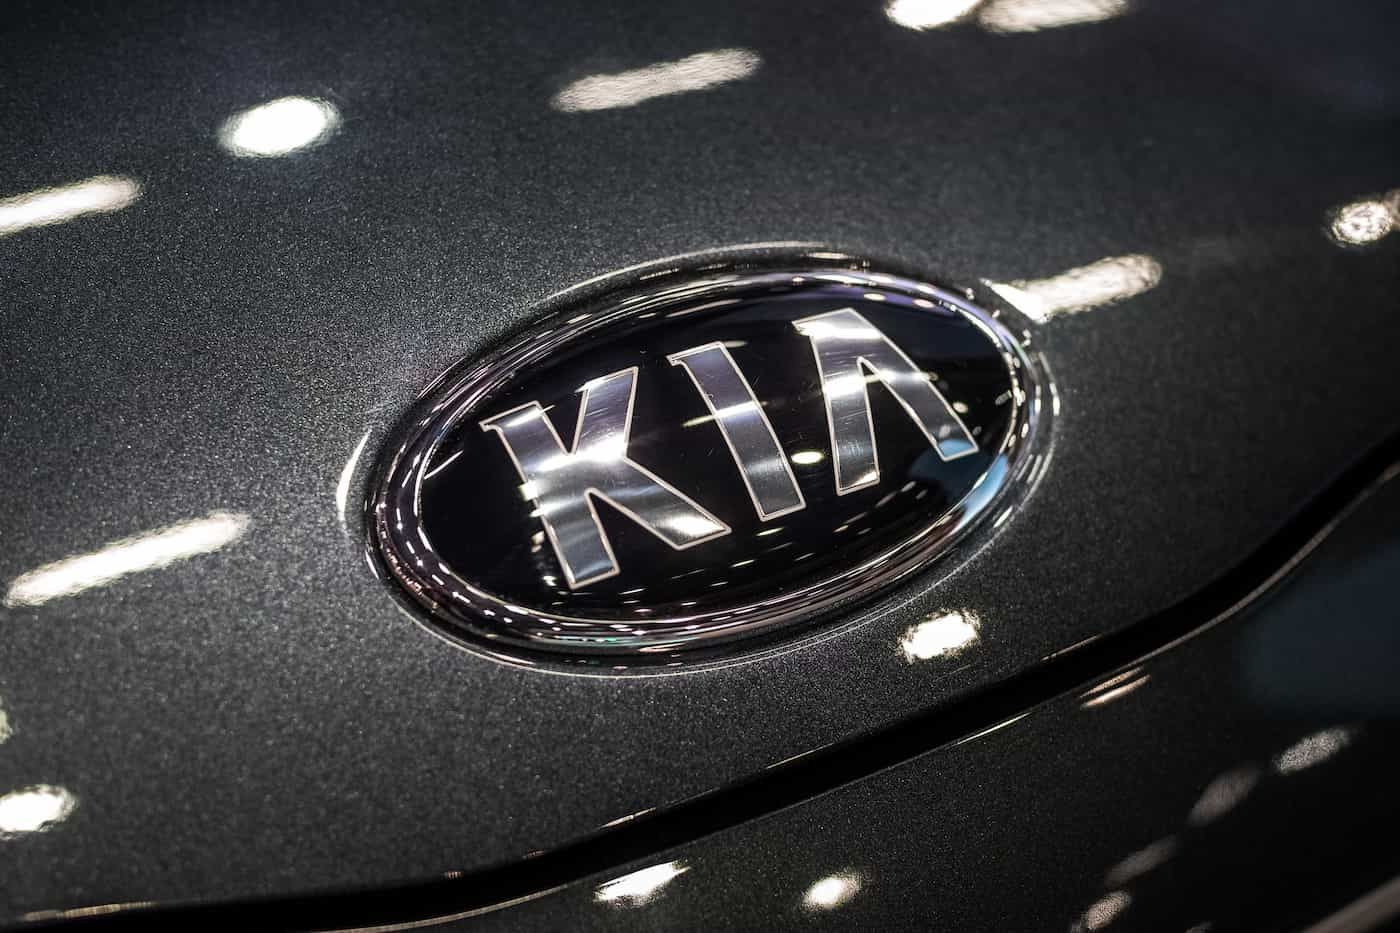 A Kia logo